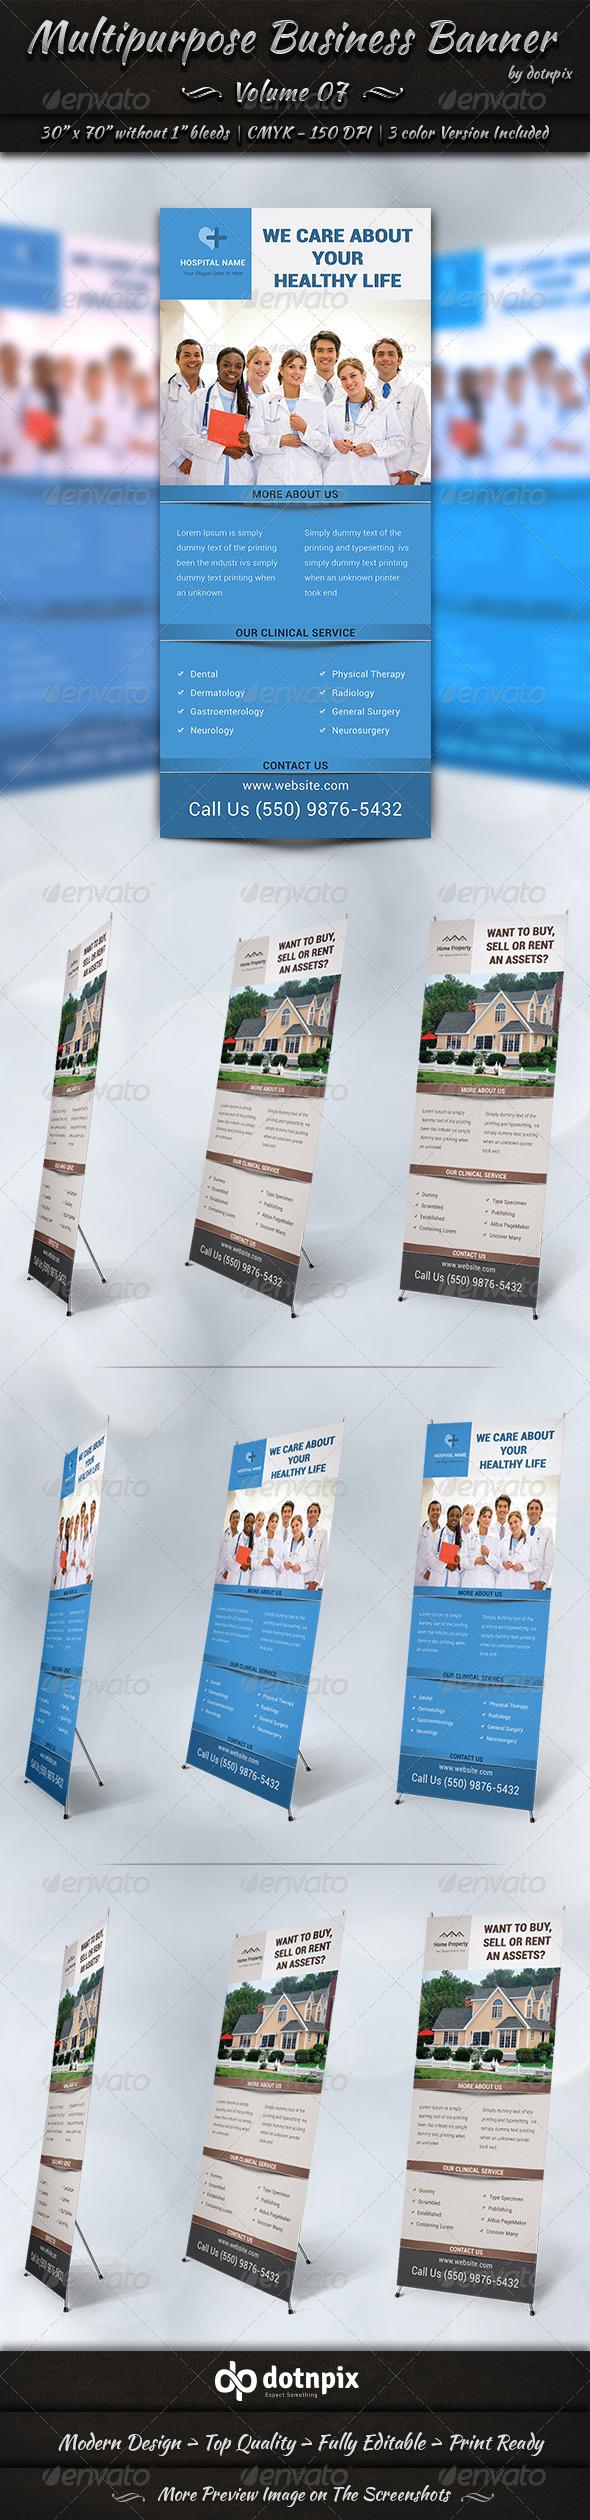 GraphicRiver Multipurpose Business Banner Volume 7 7827168